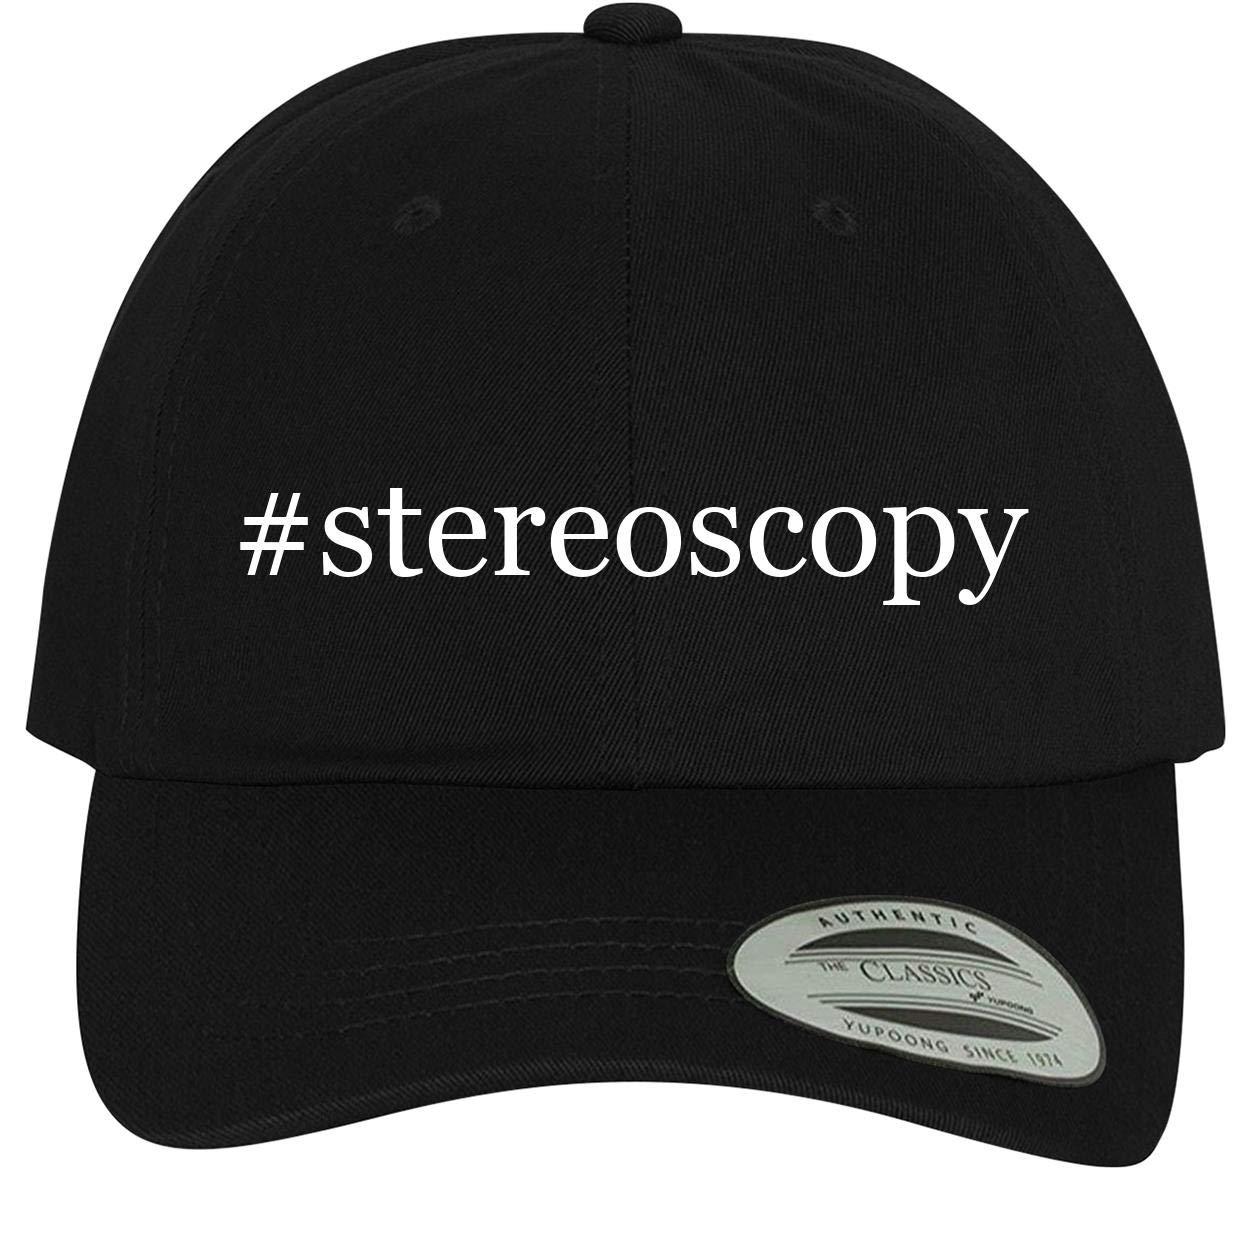 Comfortable Dad Hat Baseball Cap BH Cool Designs #Stereoscopy